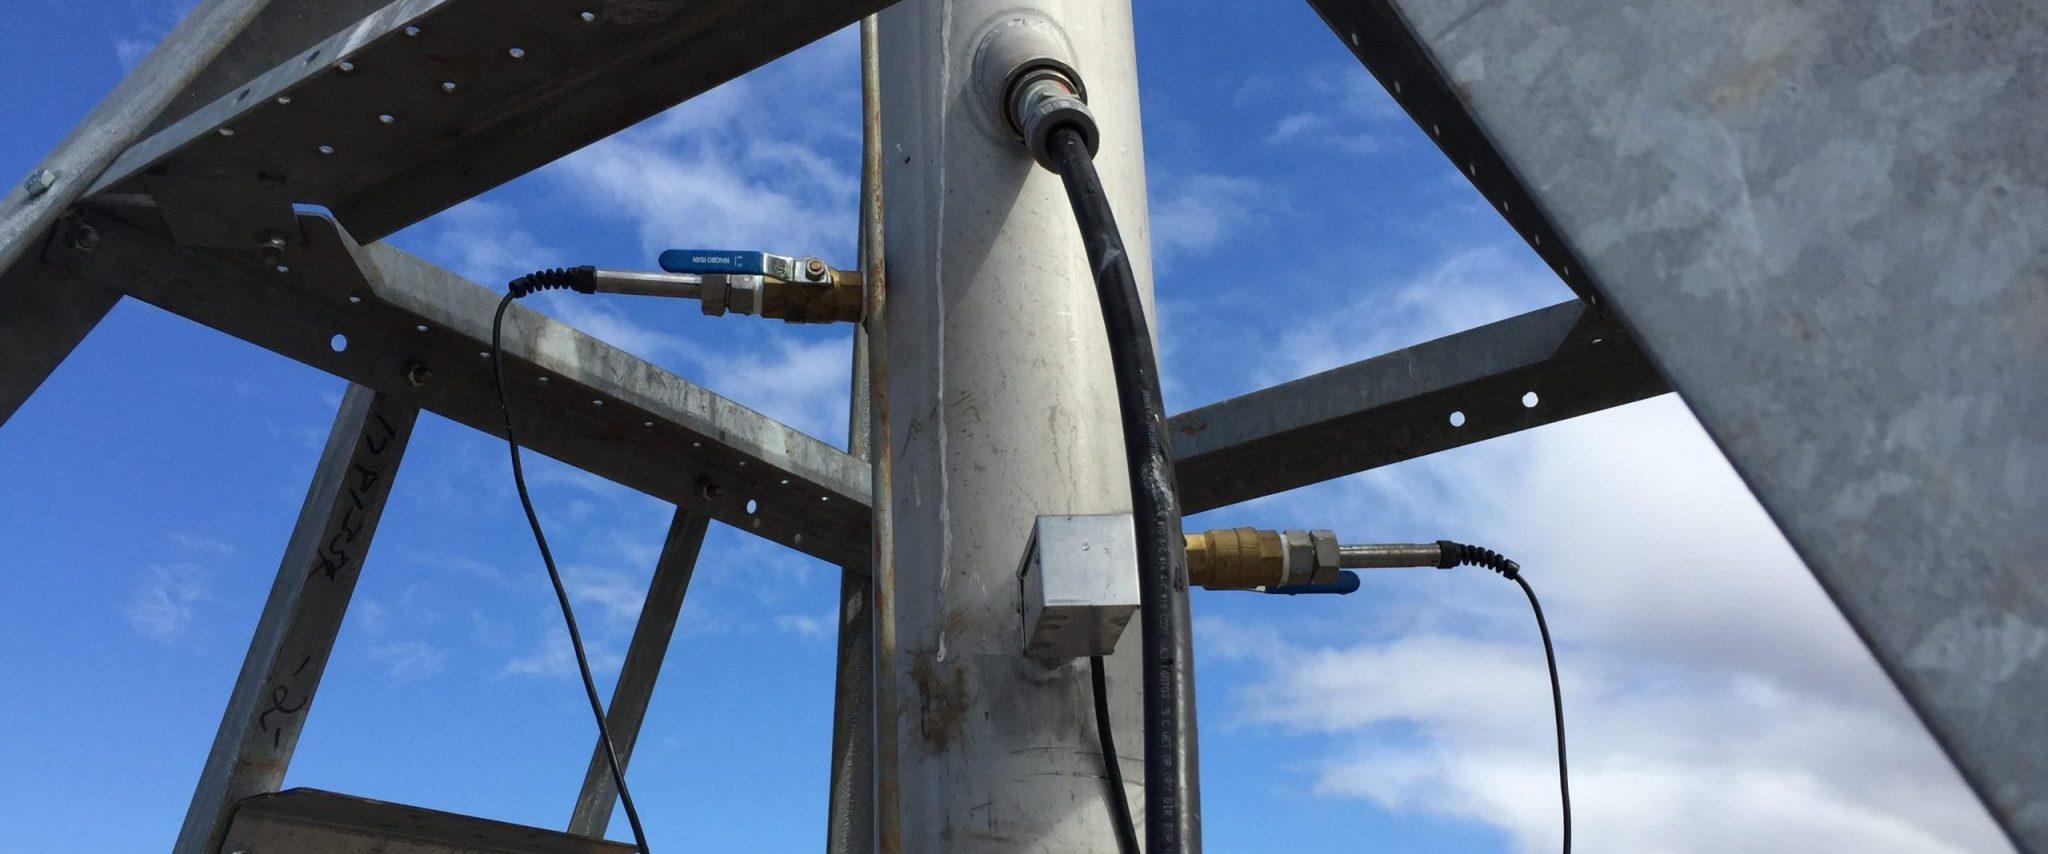 Ultrasonic flow measurement